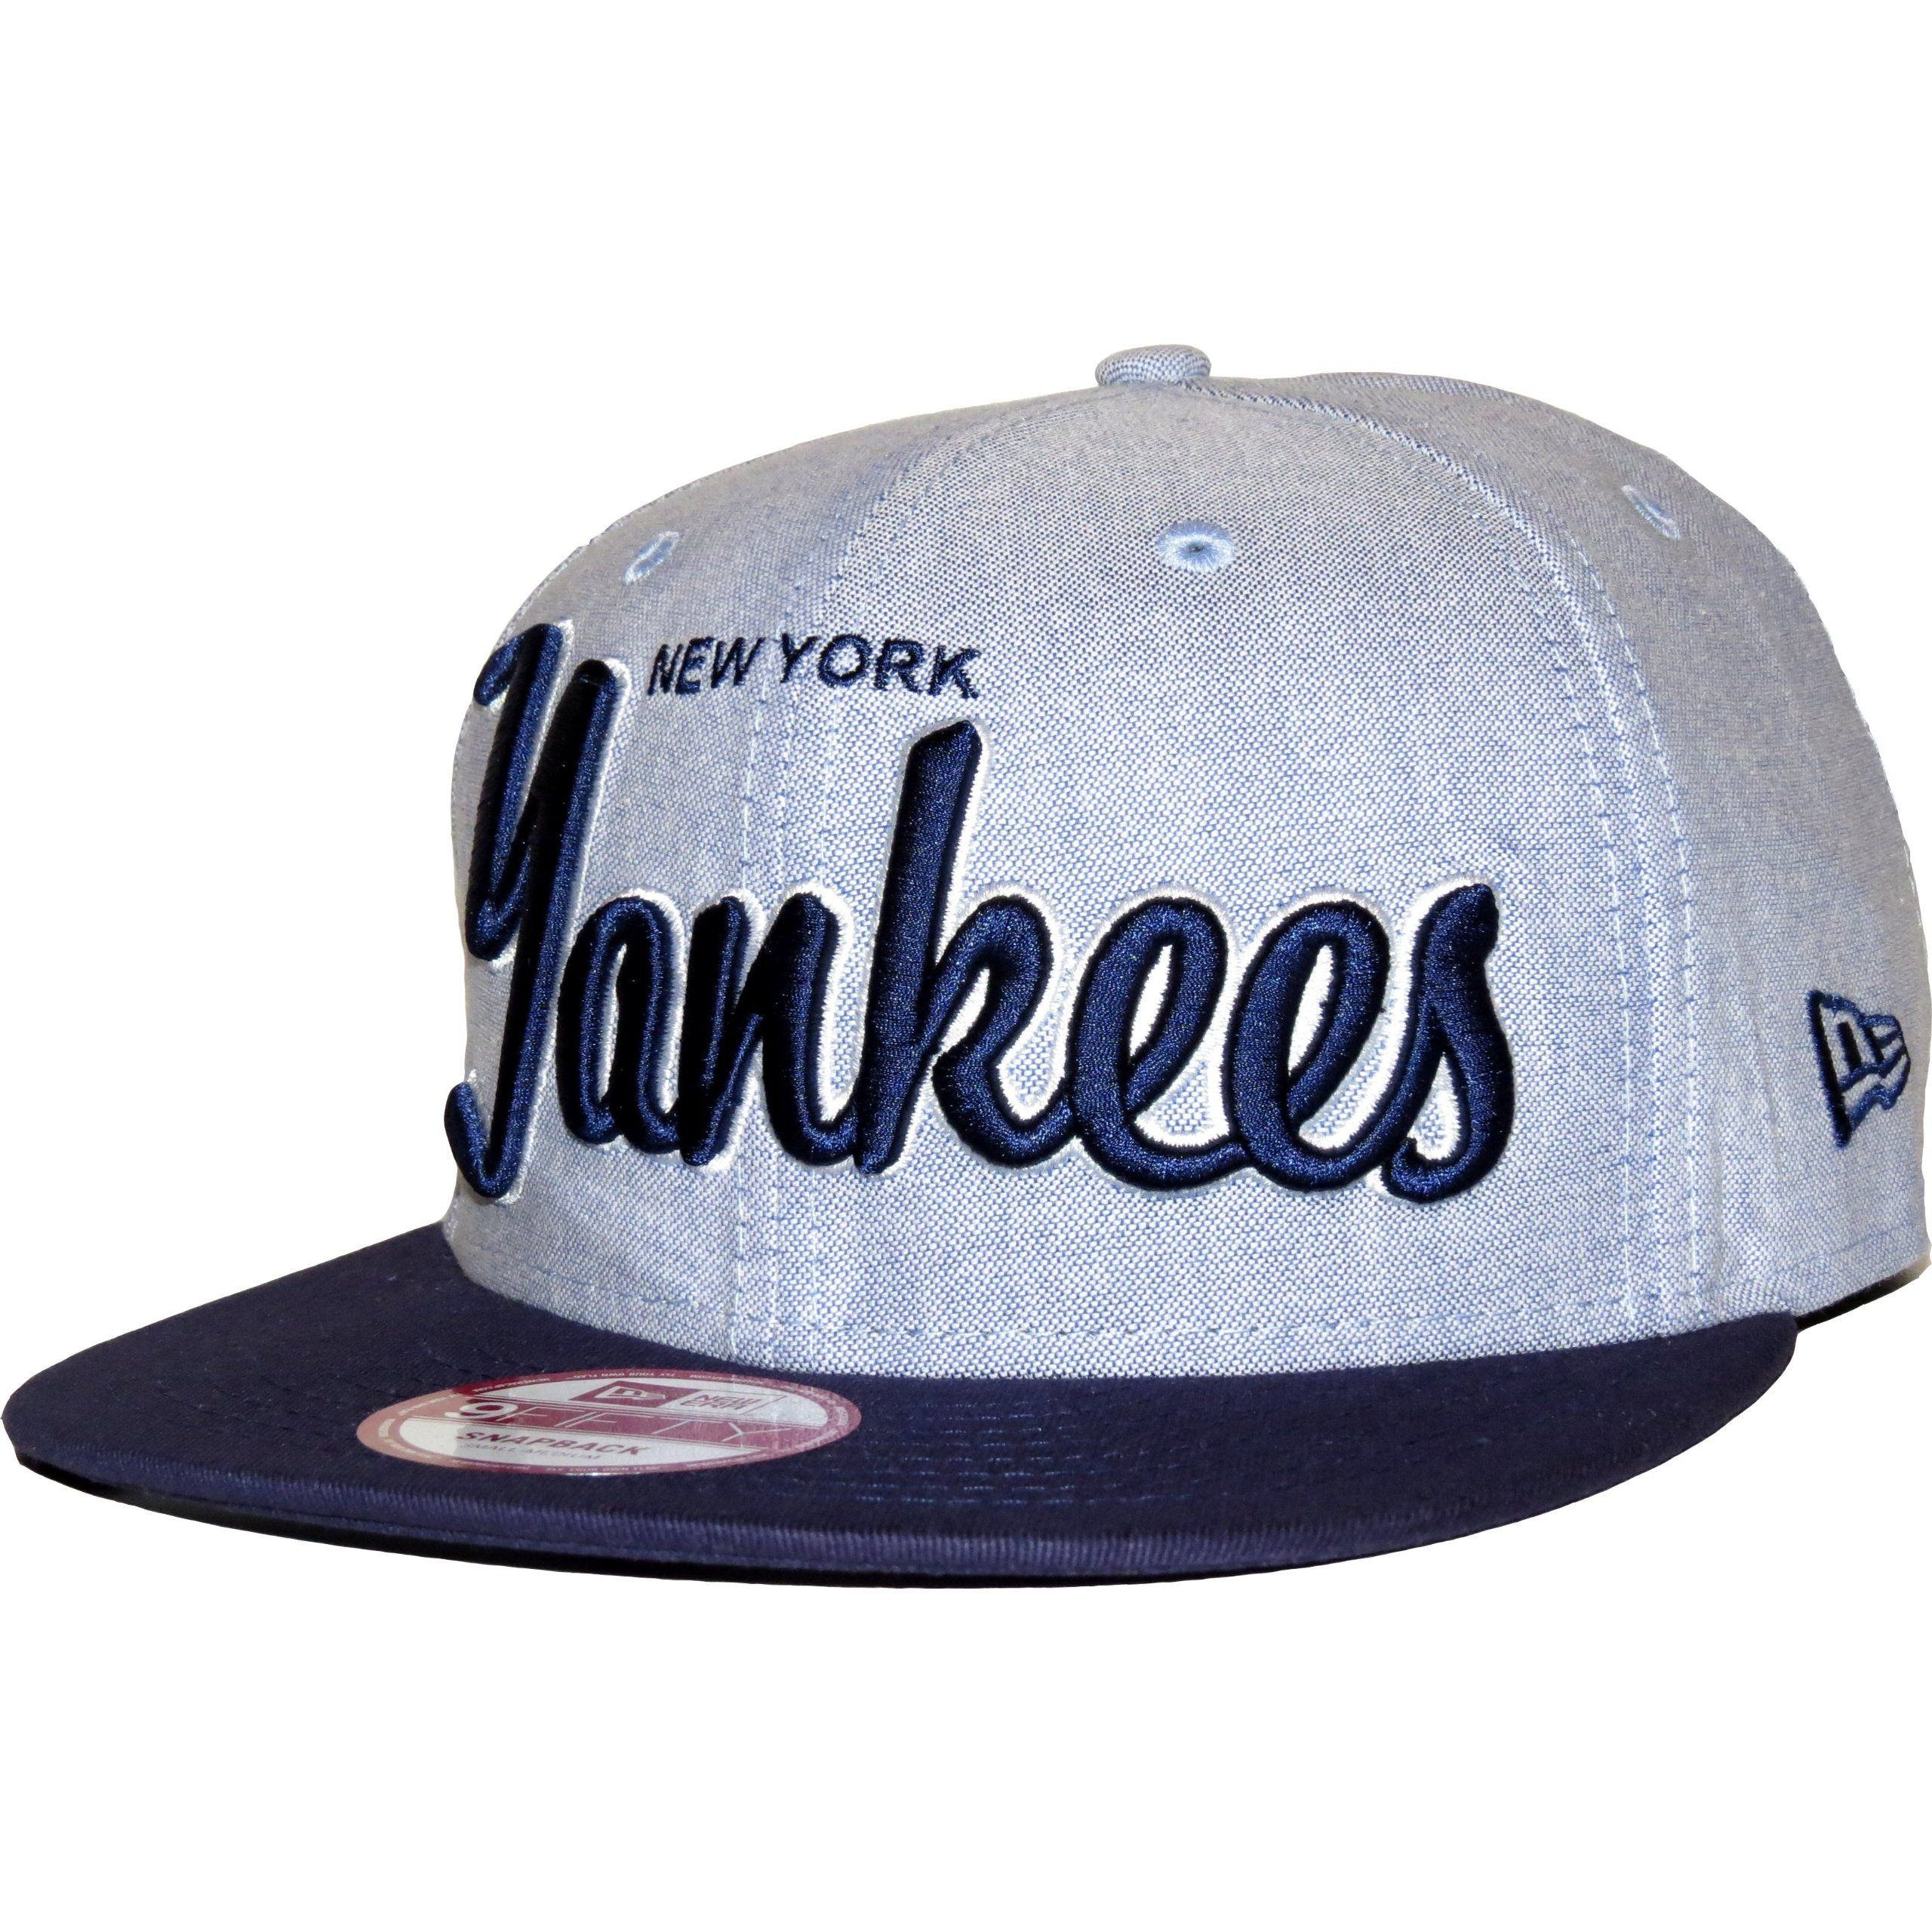 dbf2009cf9d21 New Era 9Fifty Retro Scholar NY Yankees Blue Snapback Cap   New Era ...